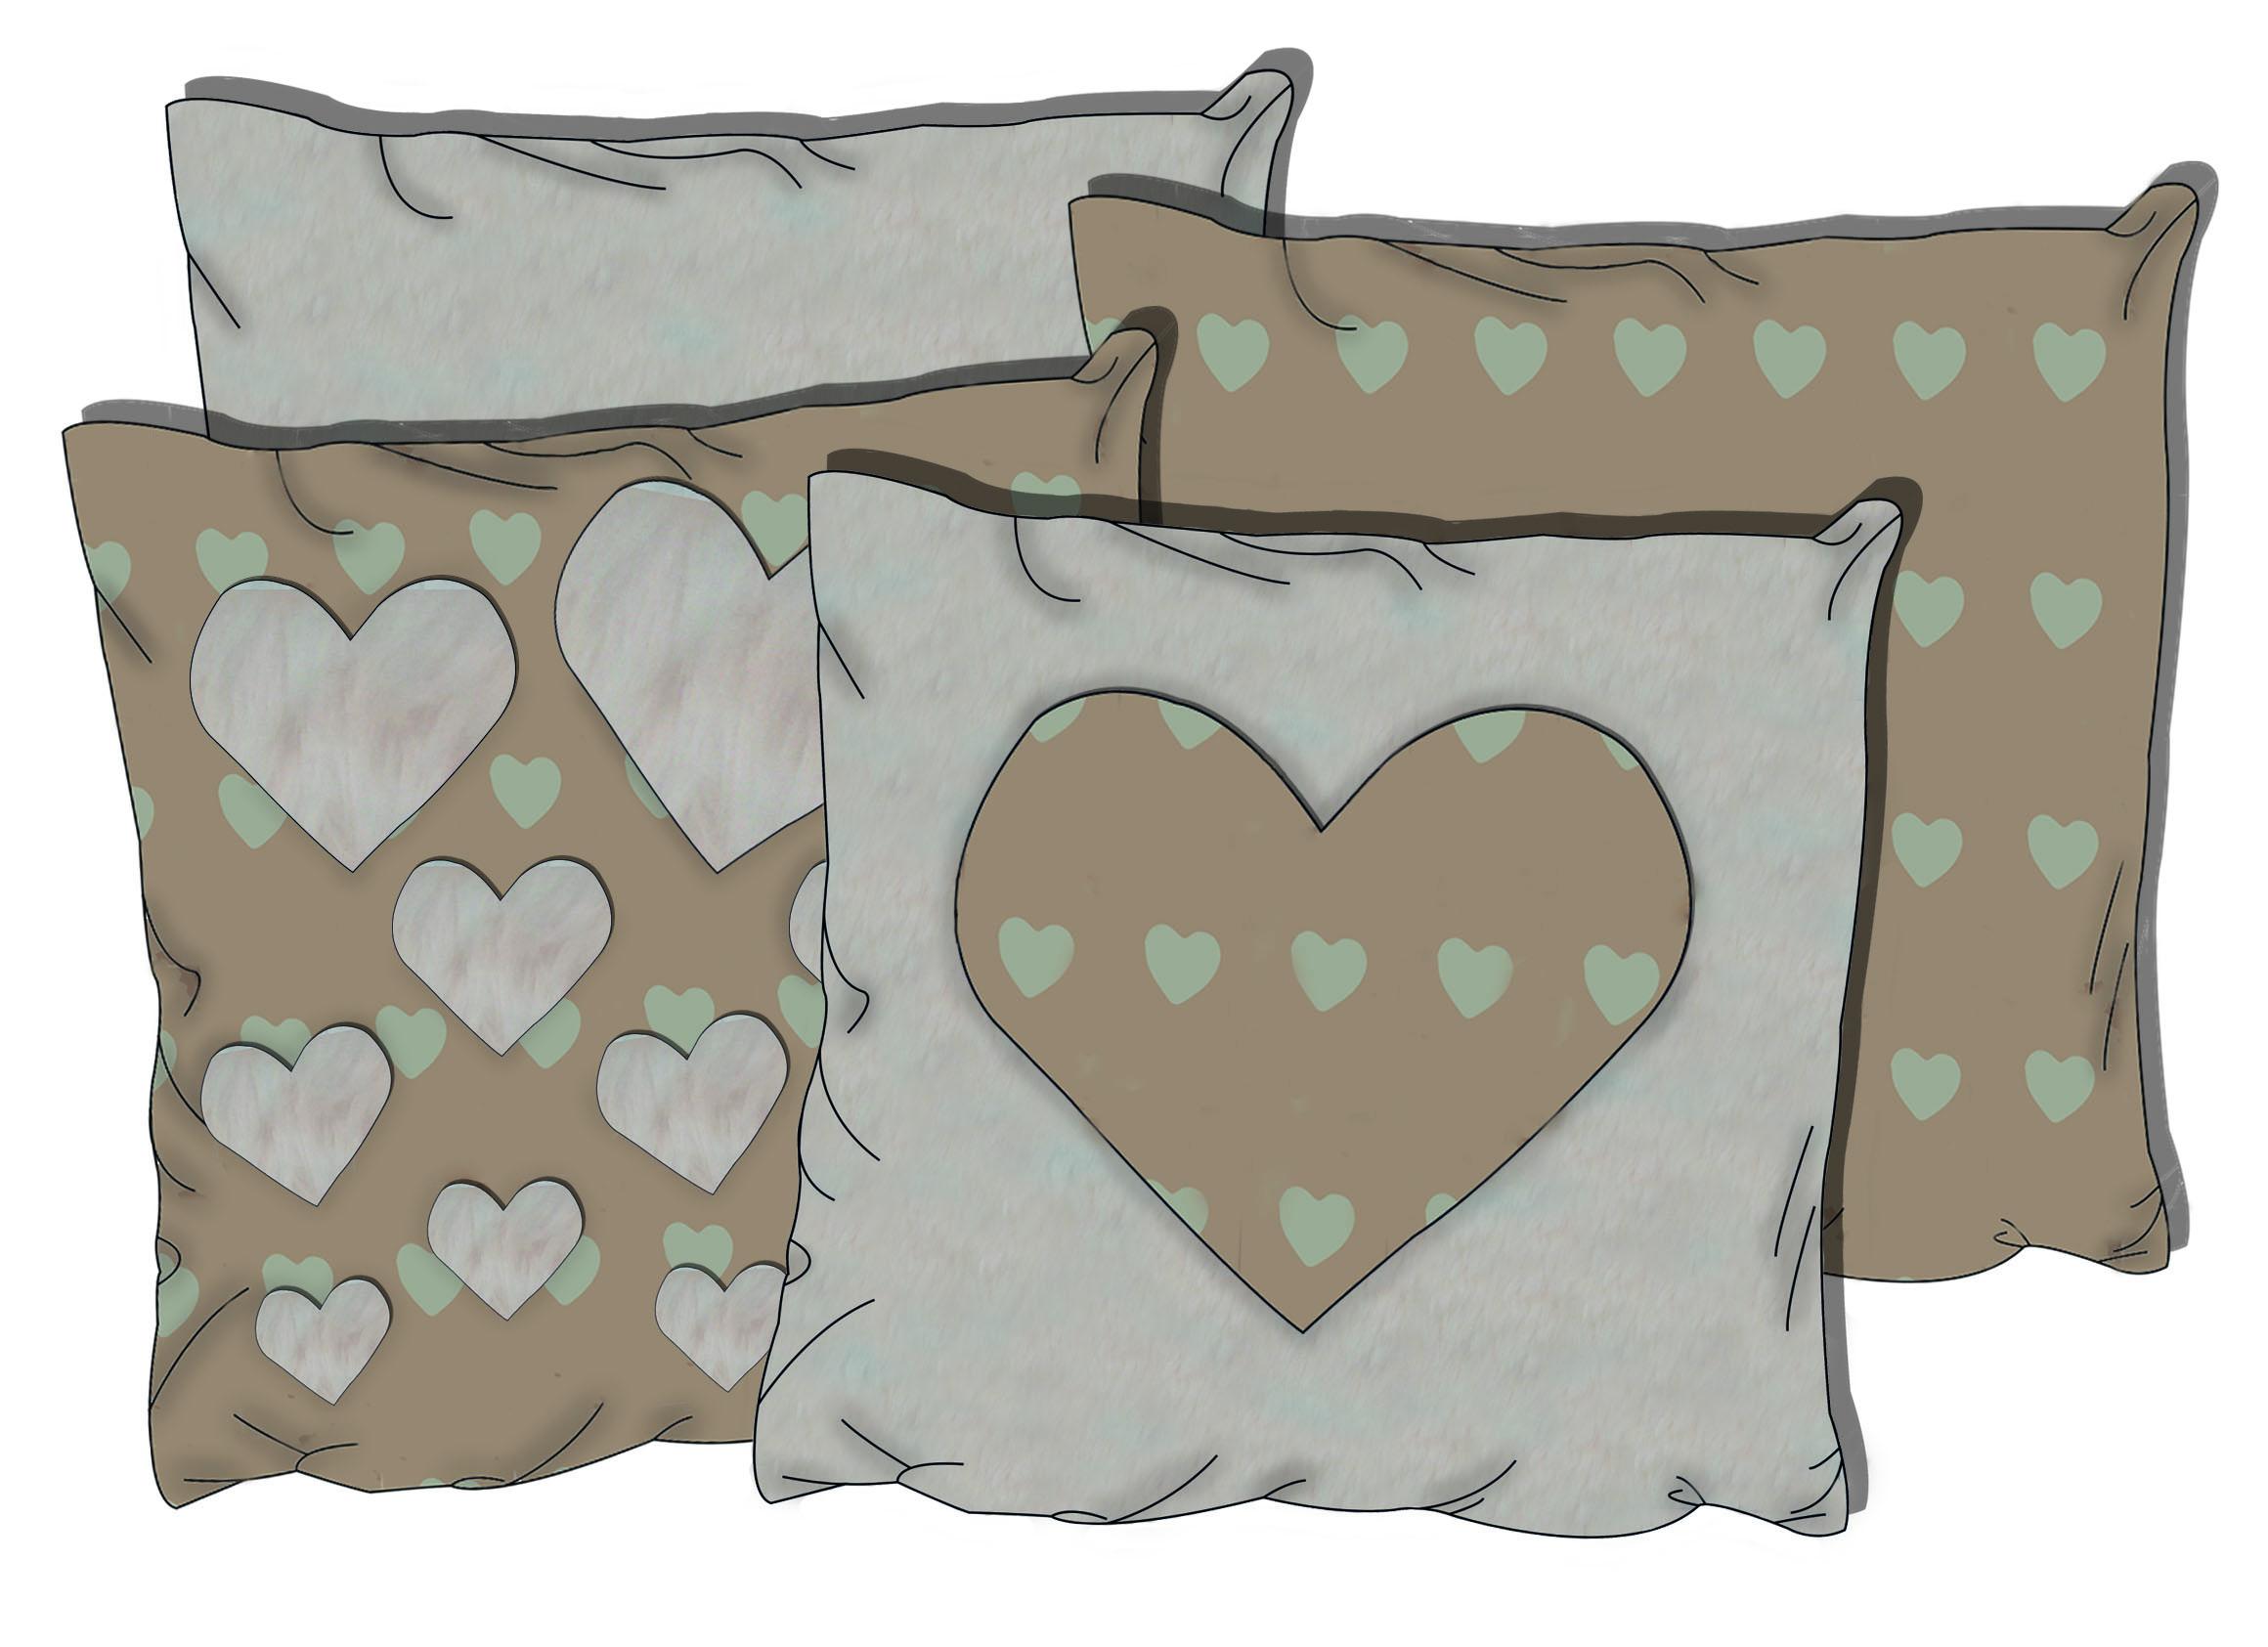 5 Ways of Using Fabrics for Valentines